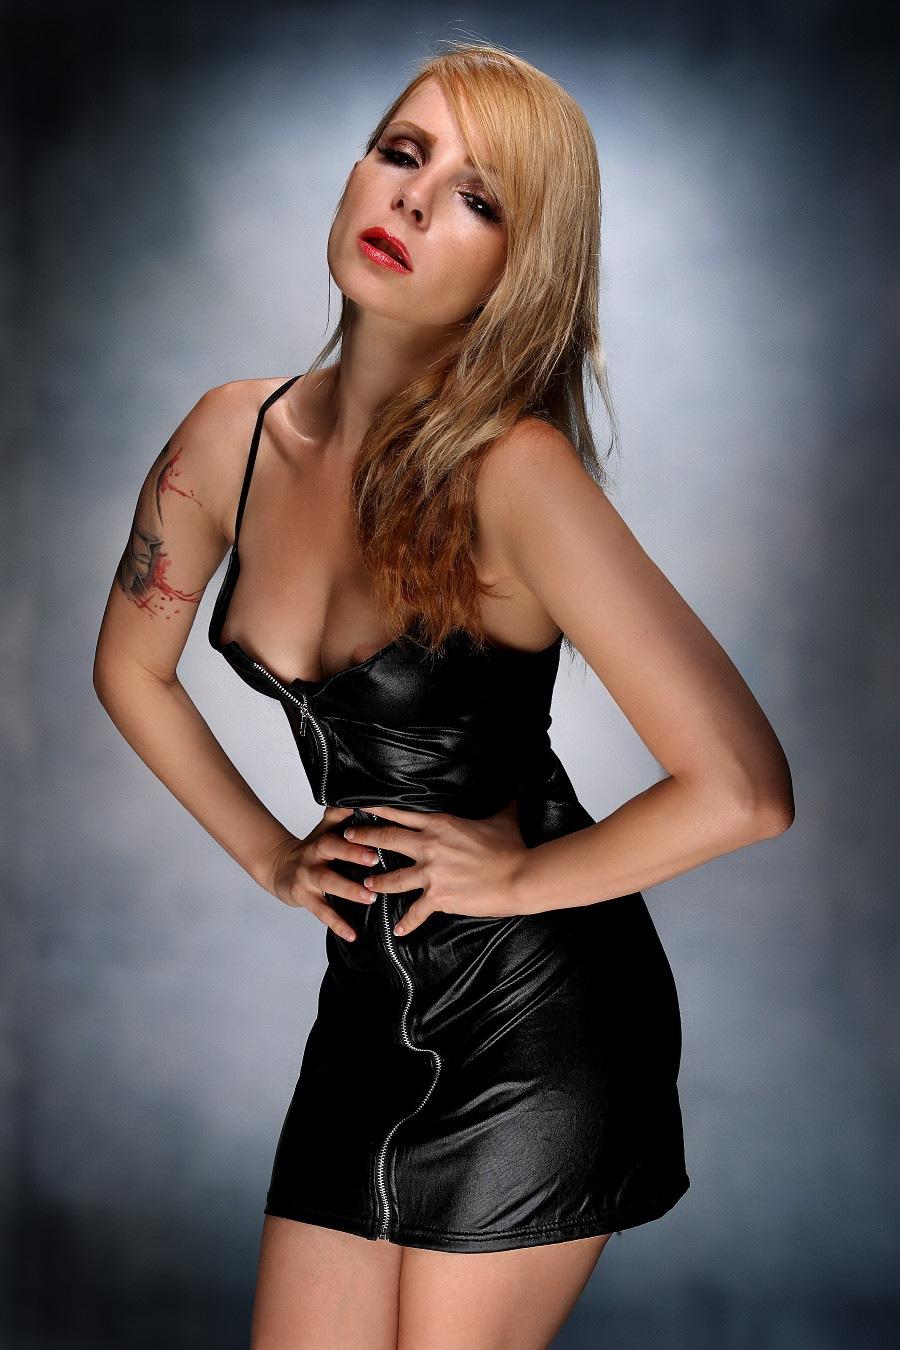 Sexy black skirt III by GuWu